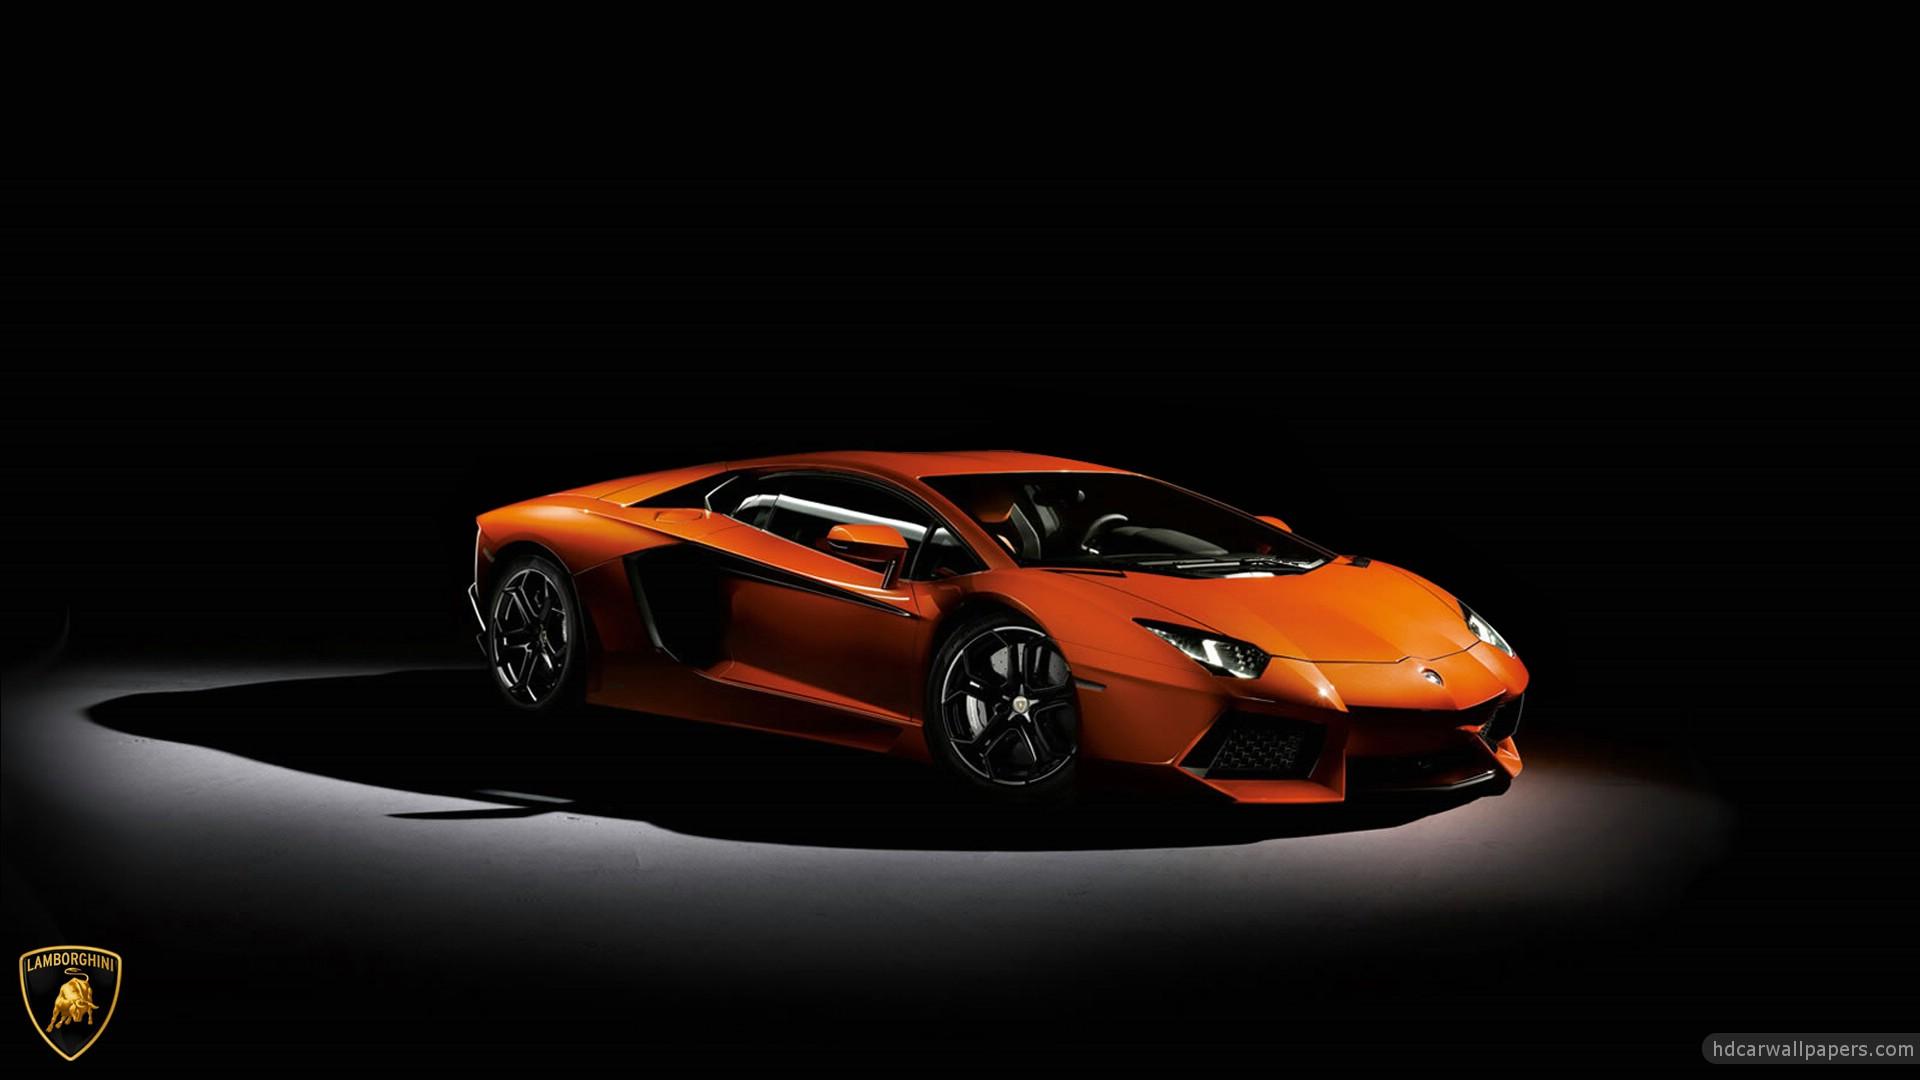 Lamborghini Aventador Hd Wallpaper Hd Car Wallpapers Id 2051